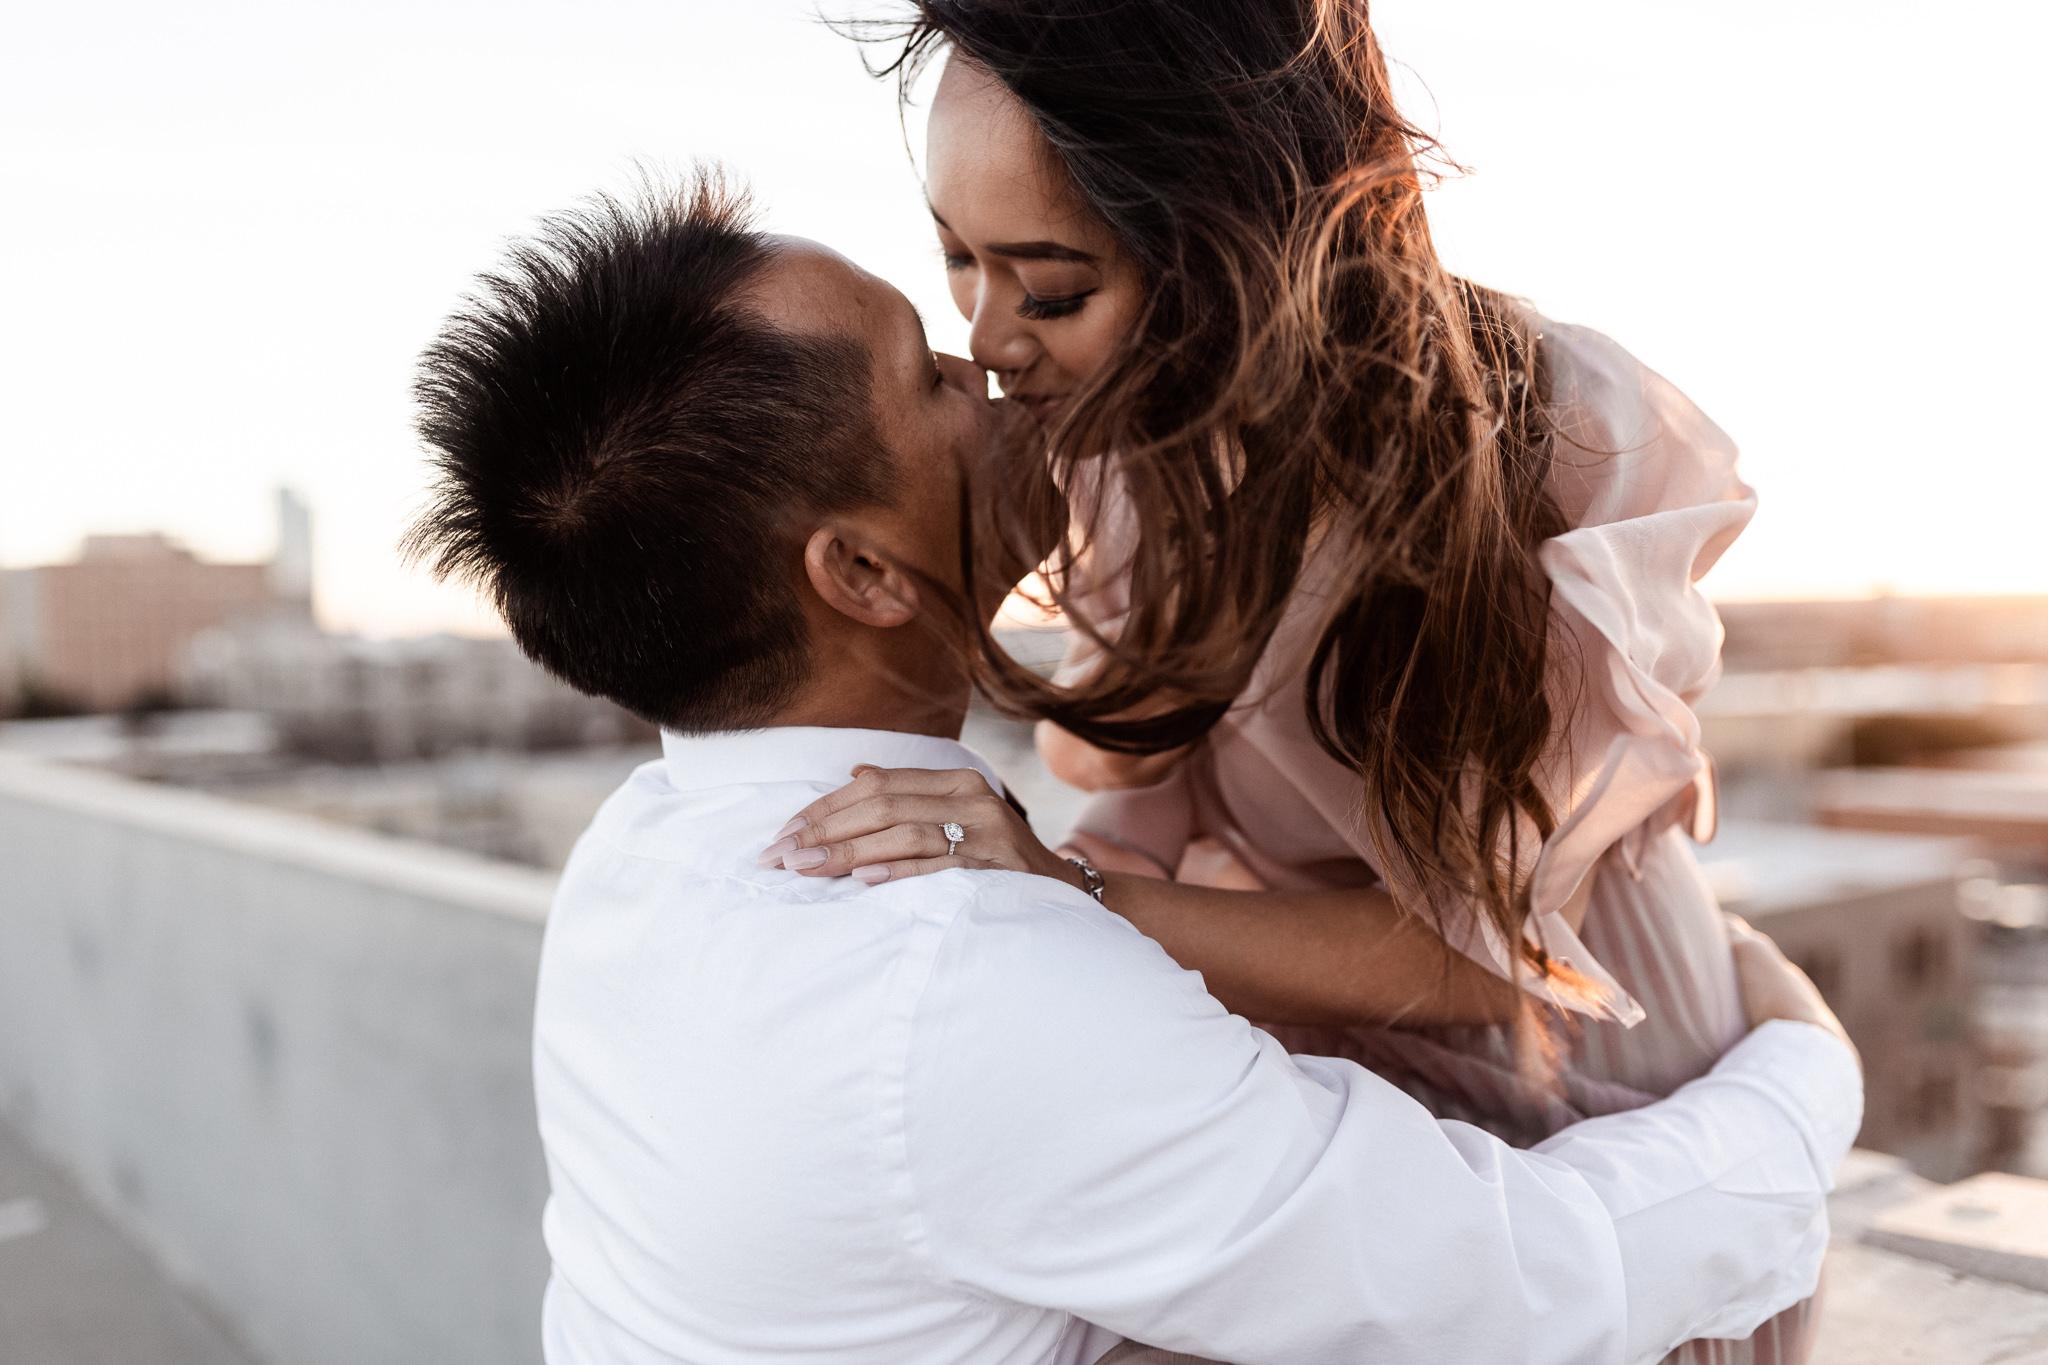 Hieu + Teresa | Colorful Romantic Downtown Engagements | Oklahoma Wedding Photographer-63.jpg